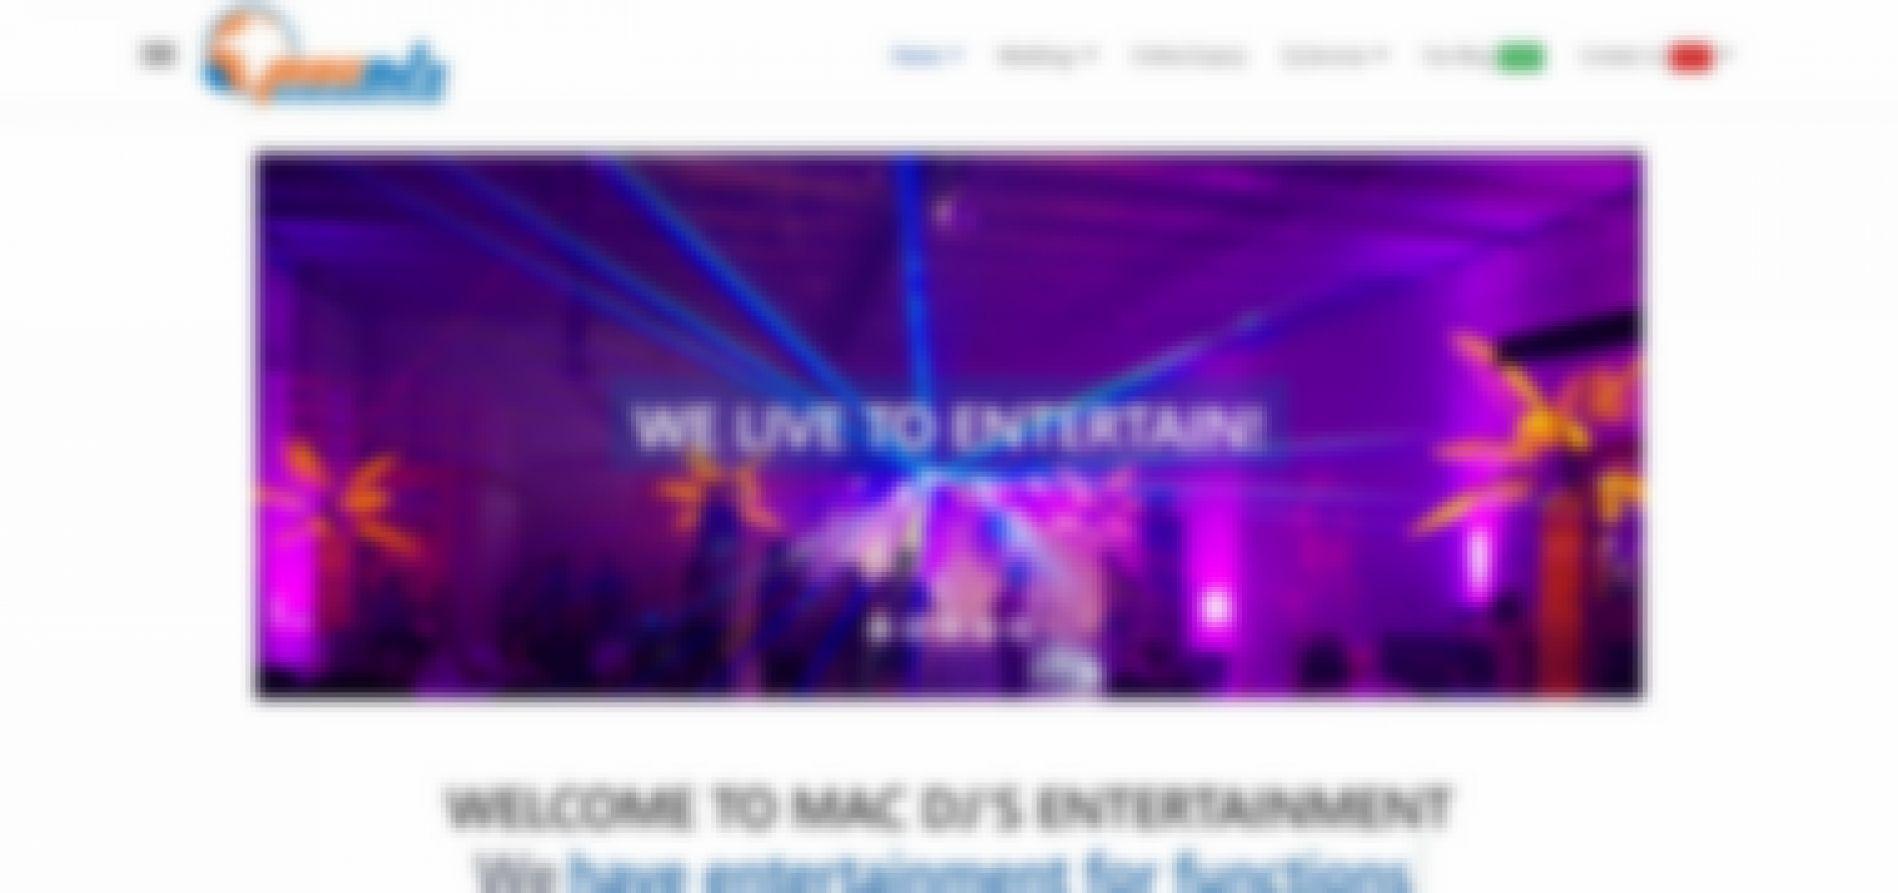 mac dj's entertainment